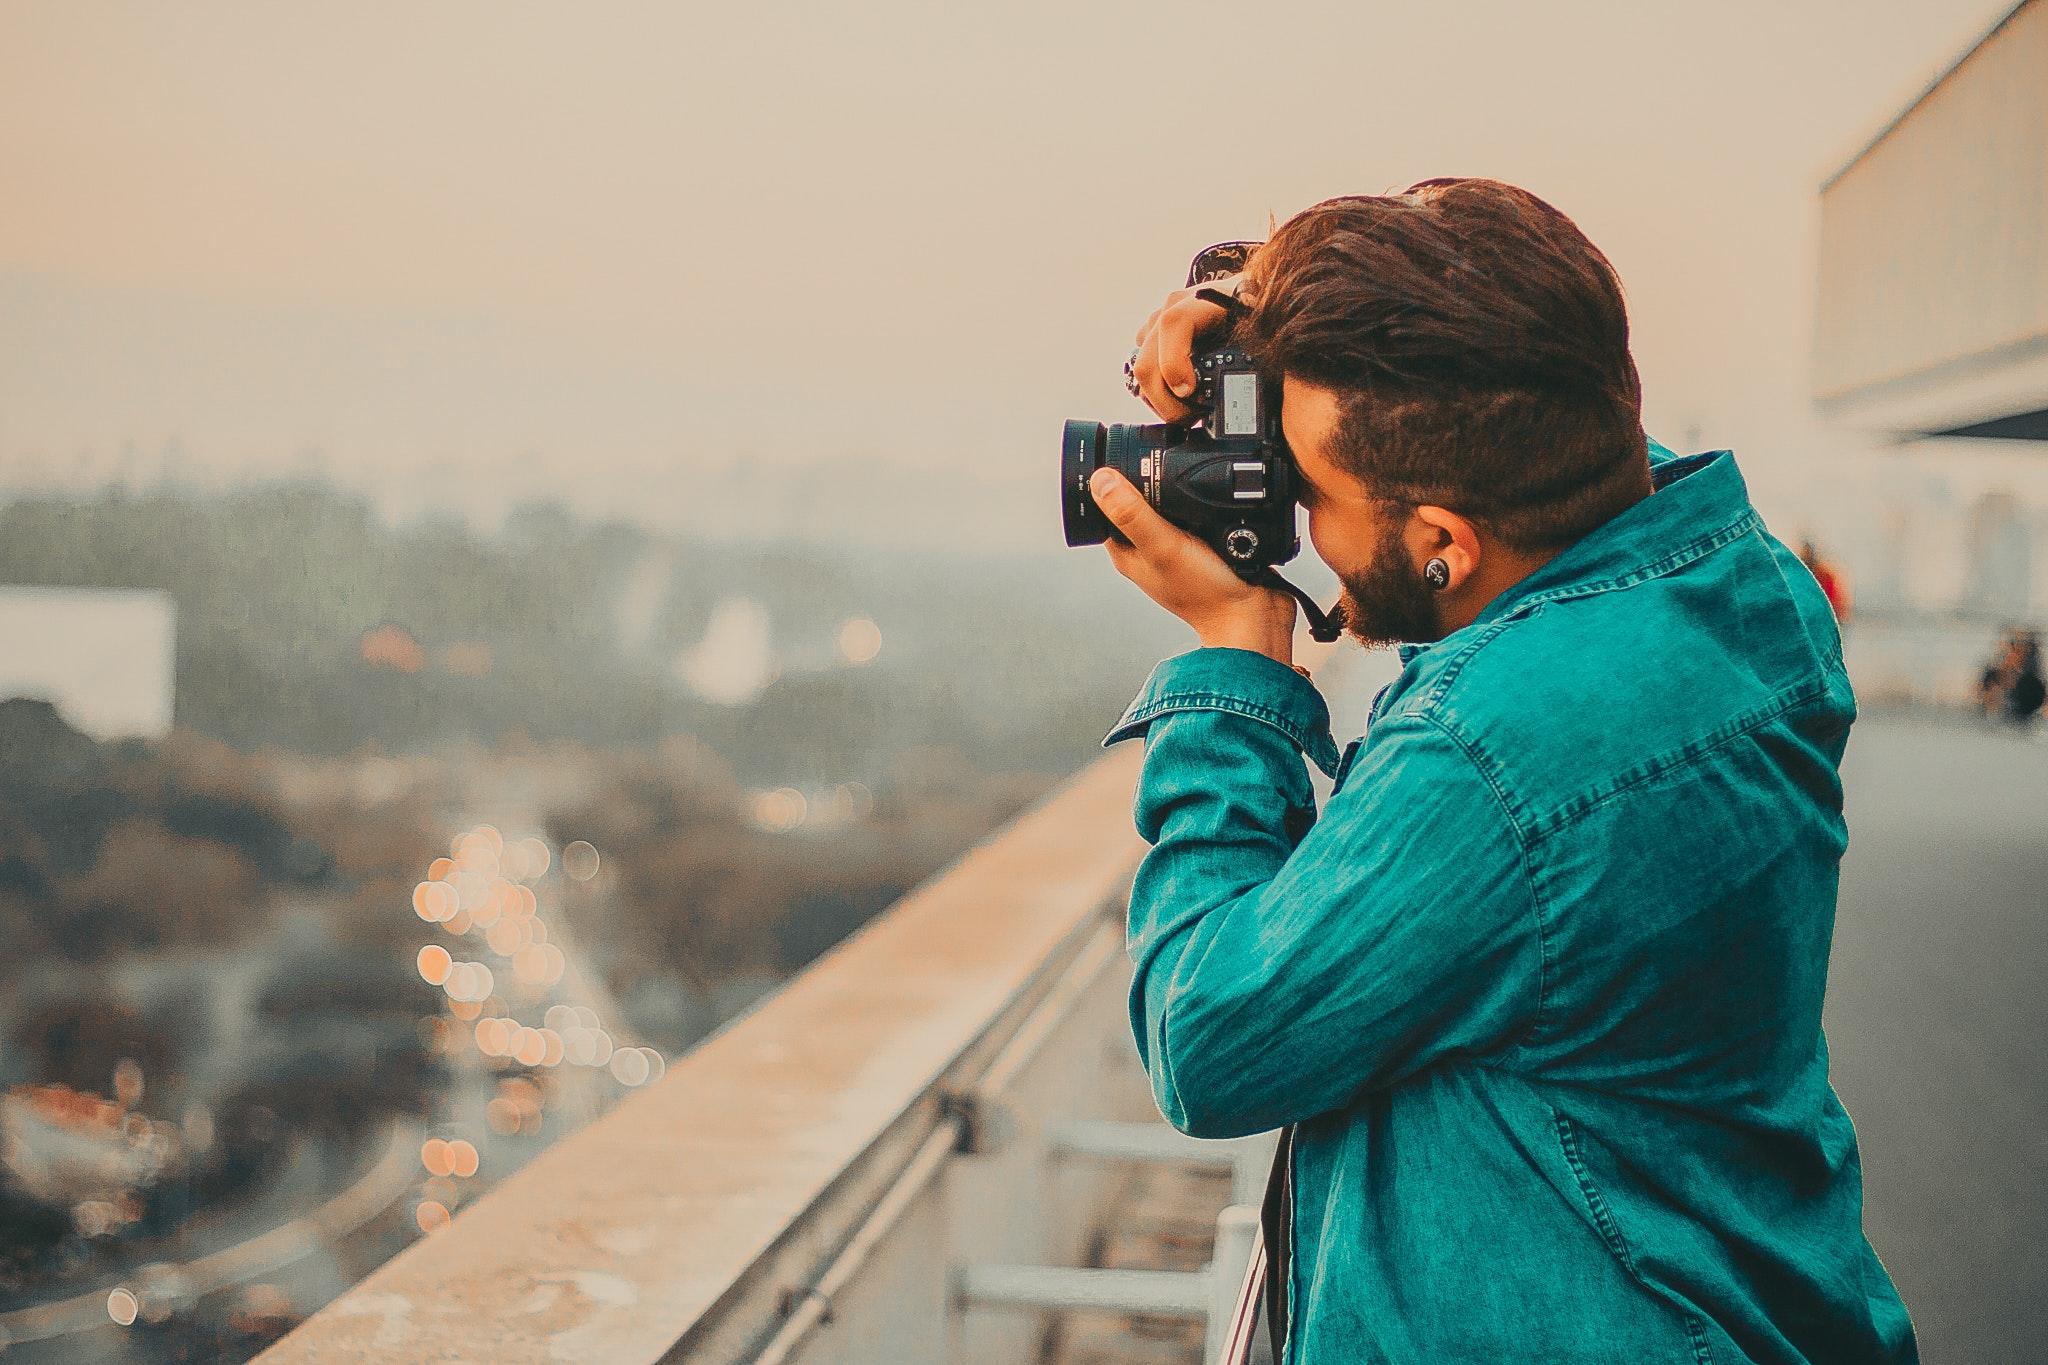 Free Photo Man In Teal Button Up Long Sleeved Shirt Shooting Using Dslr Camera Camera Daylight Dslr Free Download Jooinn